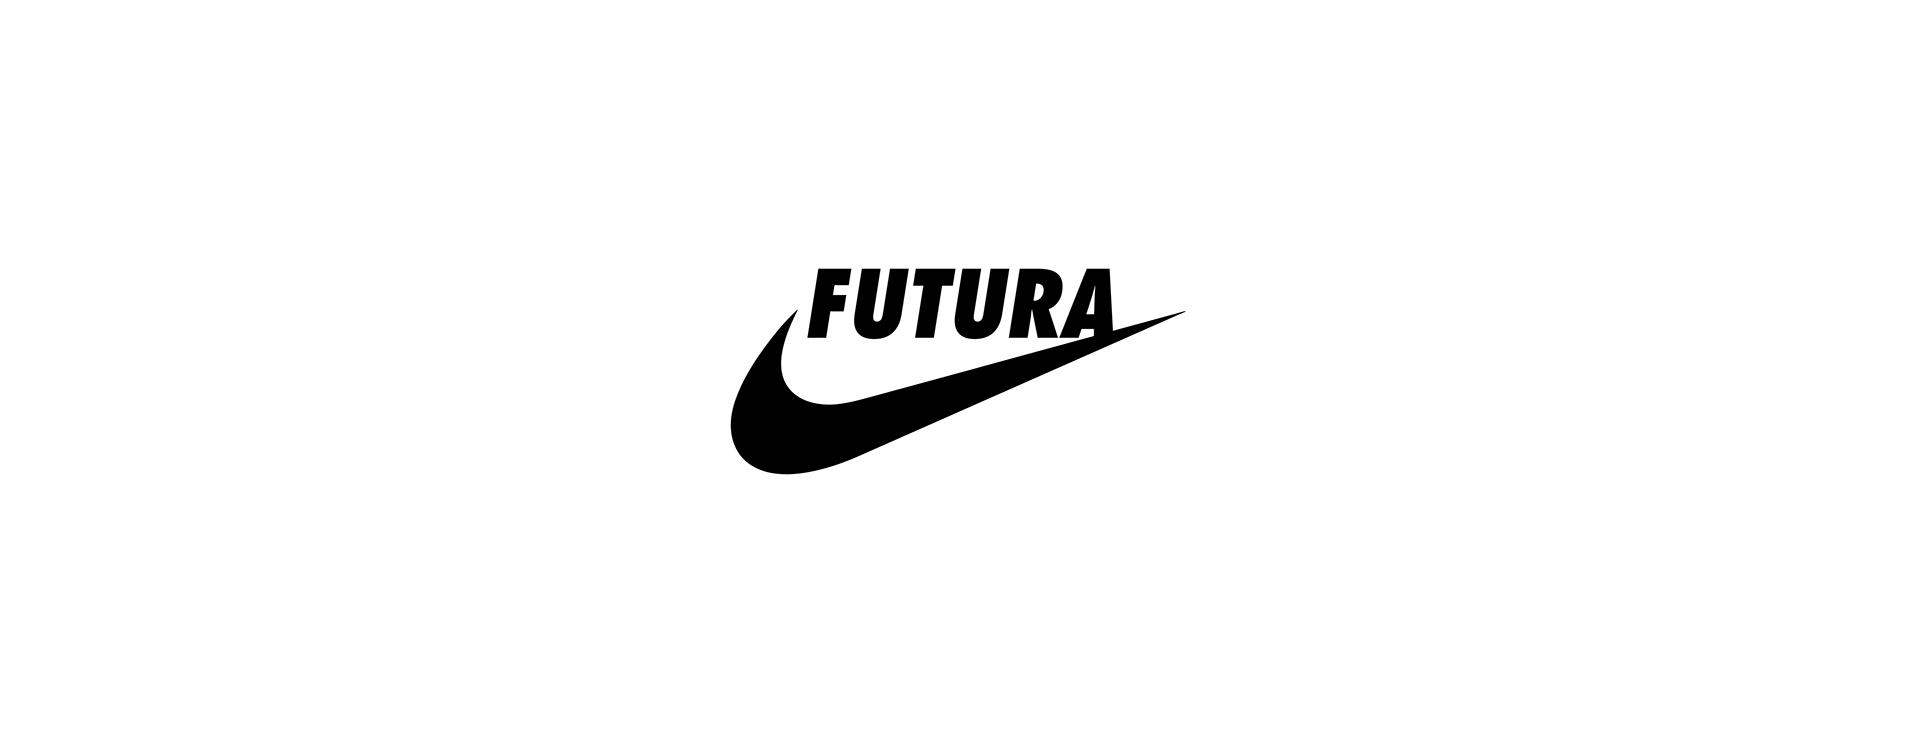 logo-fonts-design-brands-creative-2